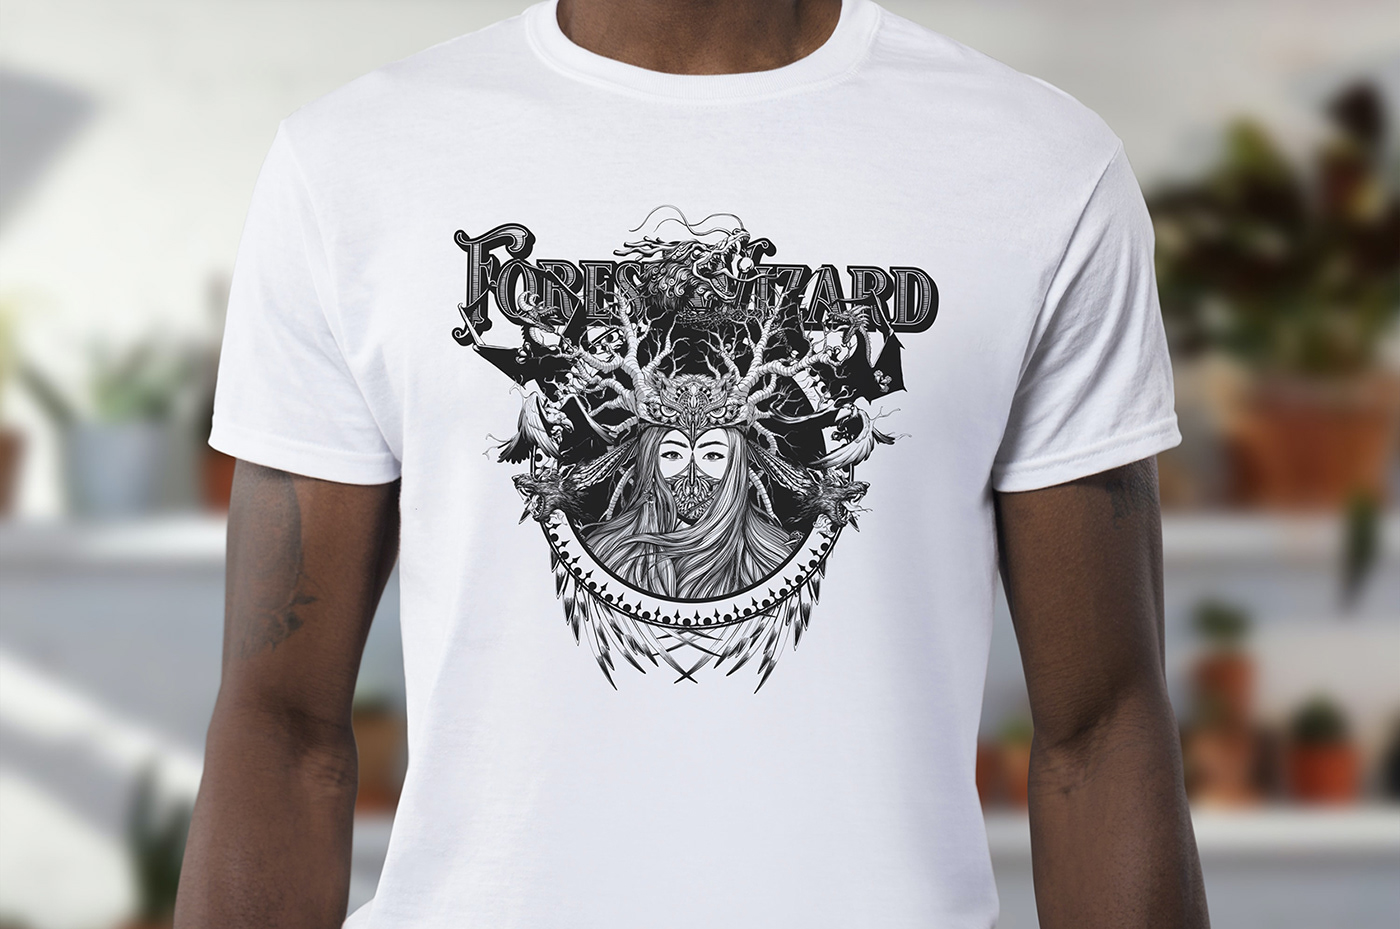 Image may contain: person, active shirt and t-shirt